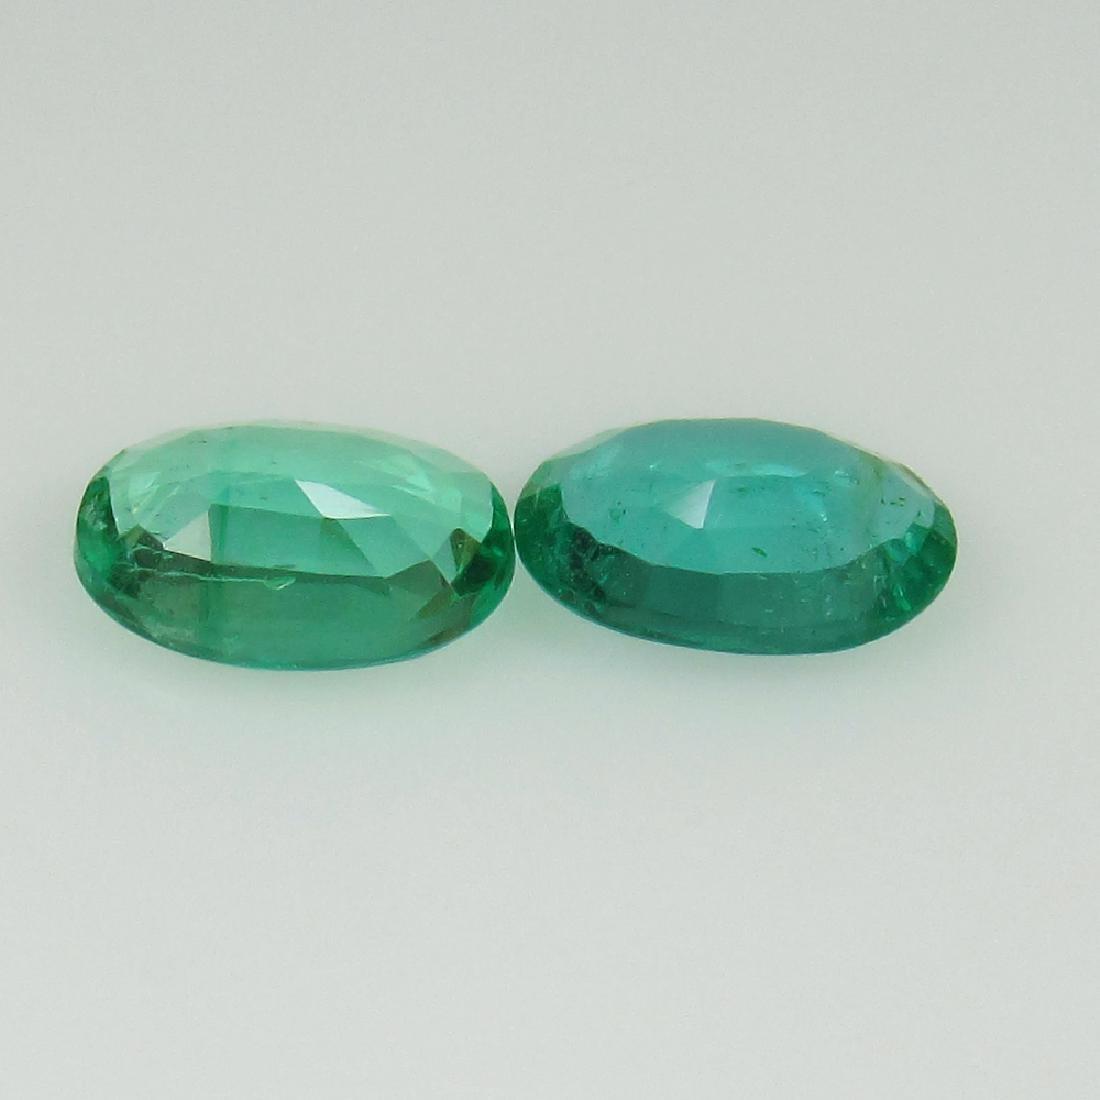 0.72 Ct Genuine Zambian Emerald Matching Oval Pair - 2